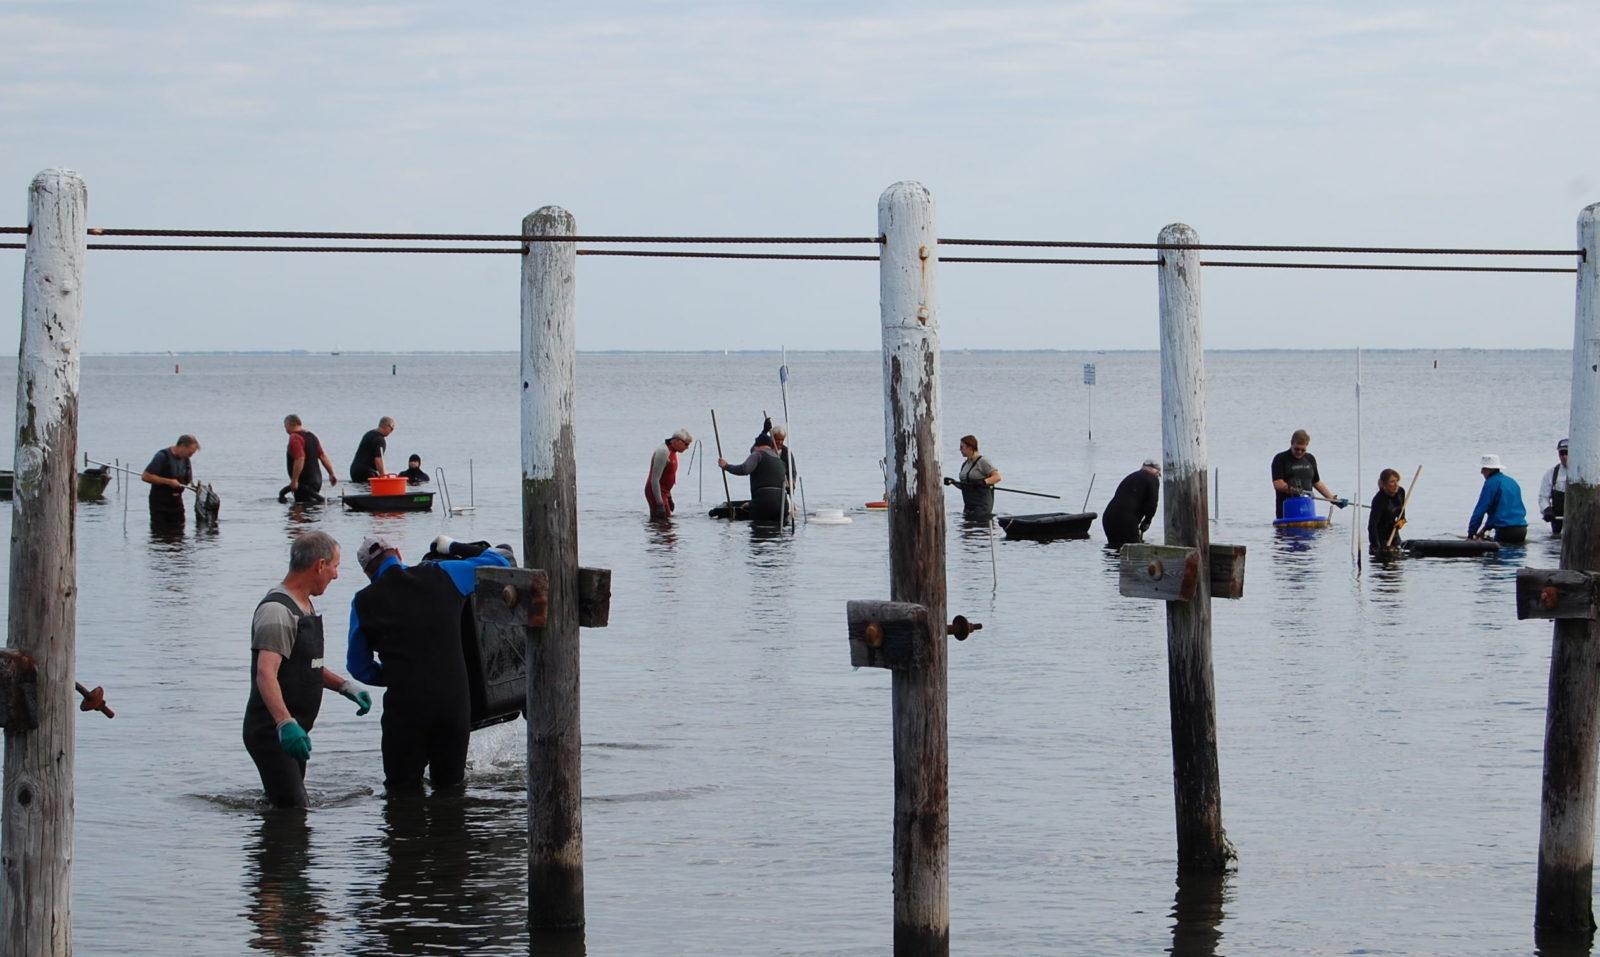 About barnegat bay partnership barnegat bay partnership for Barnegat bay fishing